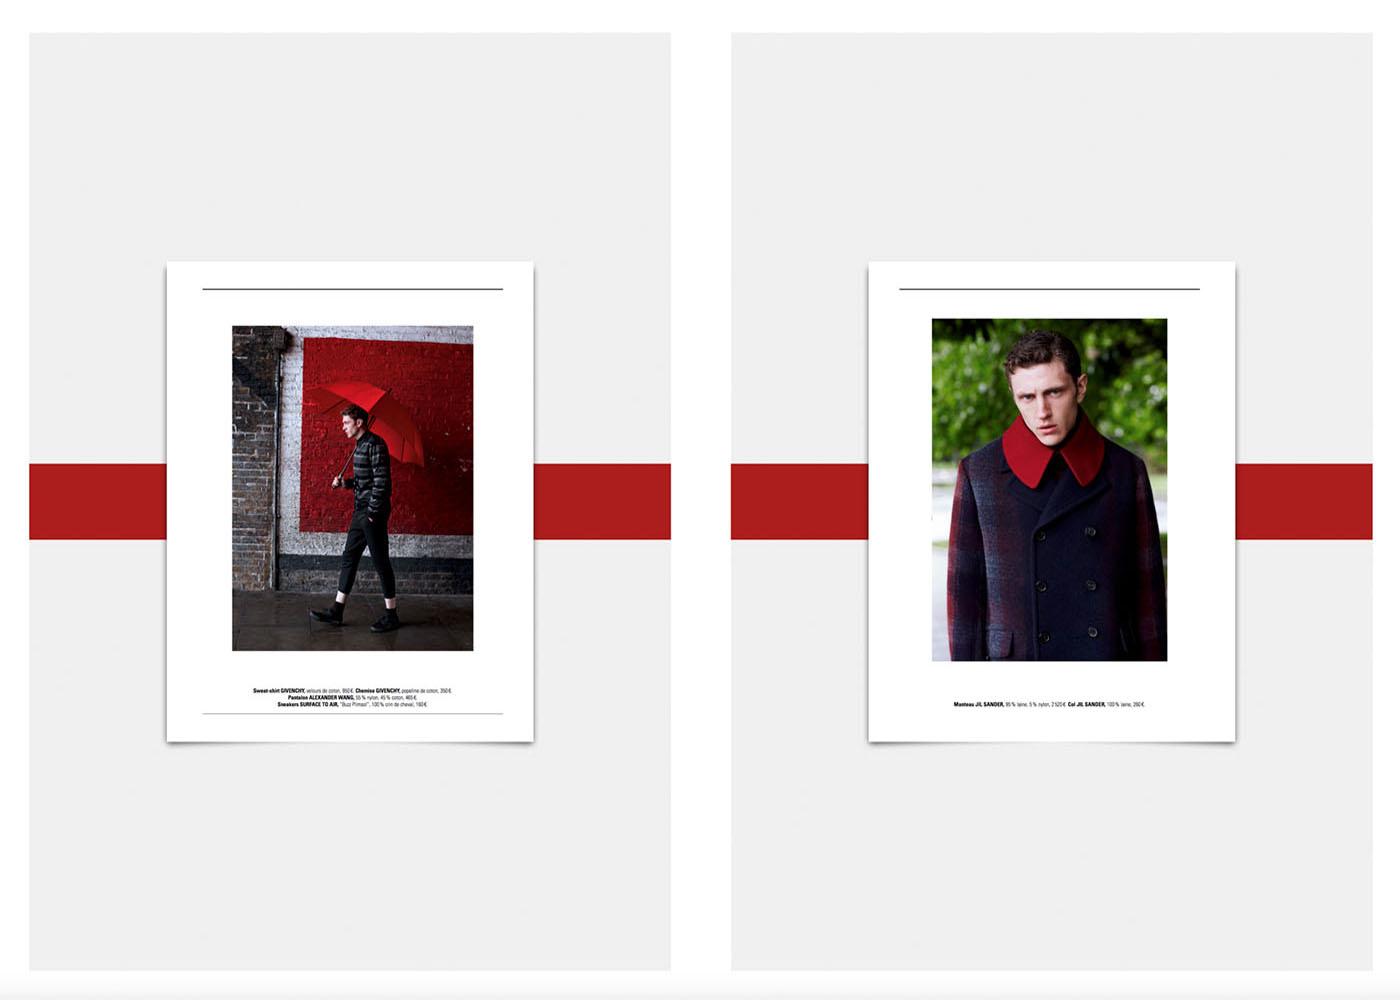 PRINTEMPS Catalogue Homme London Mania. Mode Homme Givenchy, Alexander Wang, Lanvin, Melinda Gloss